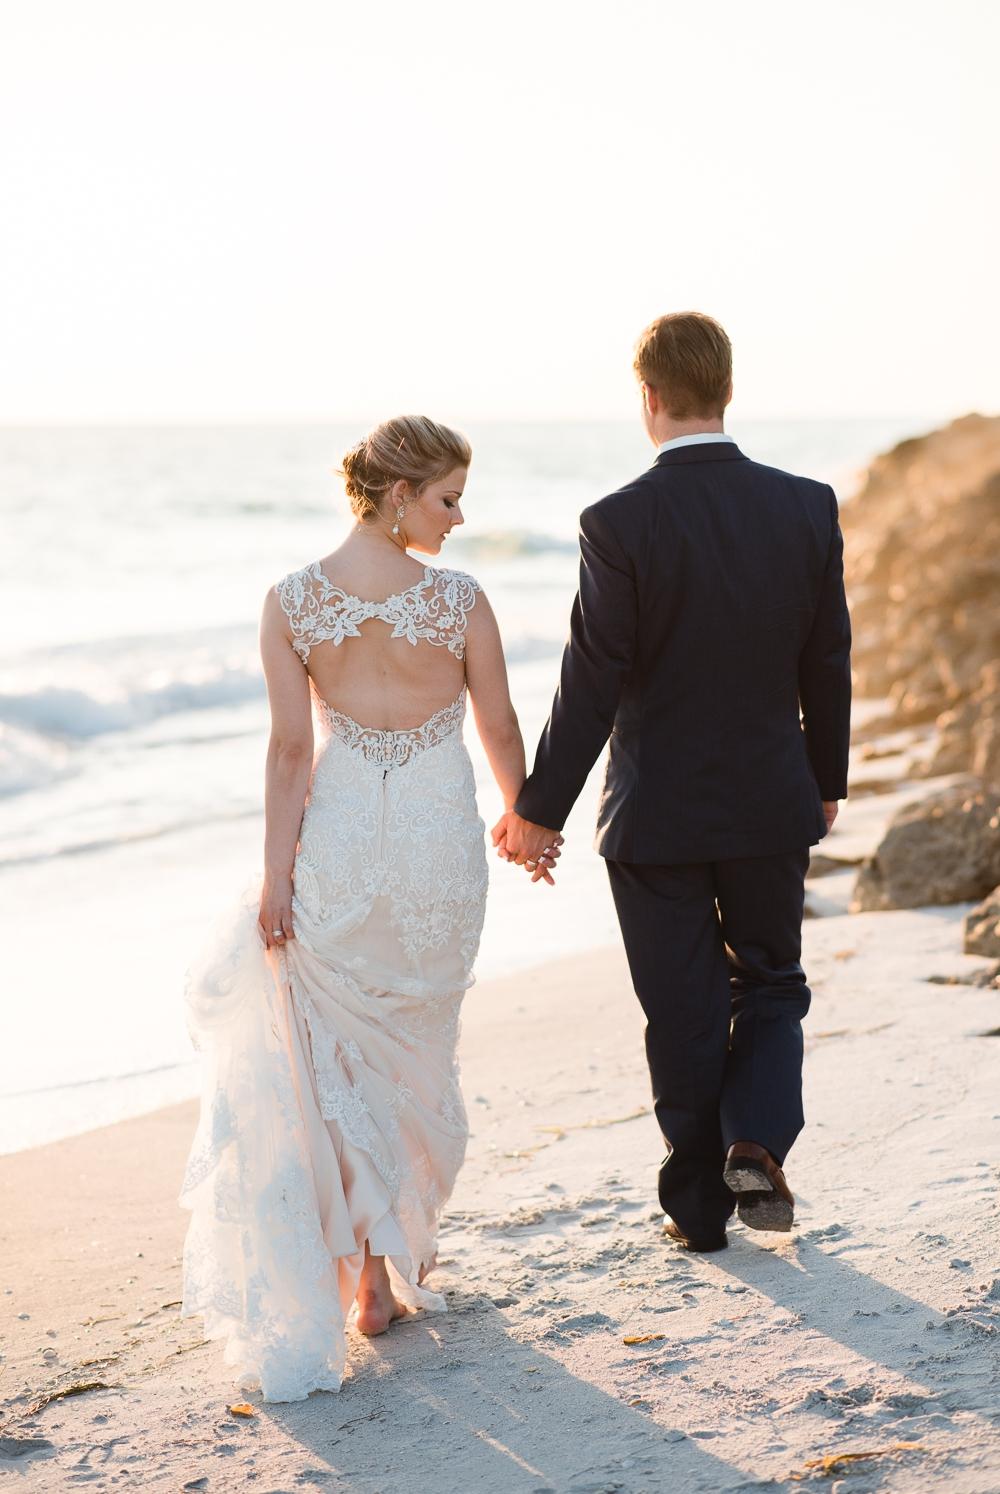 2016 HLM Wedding Beach Shoot 16.jpg